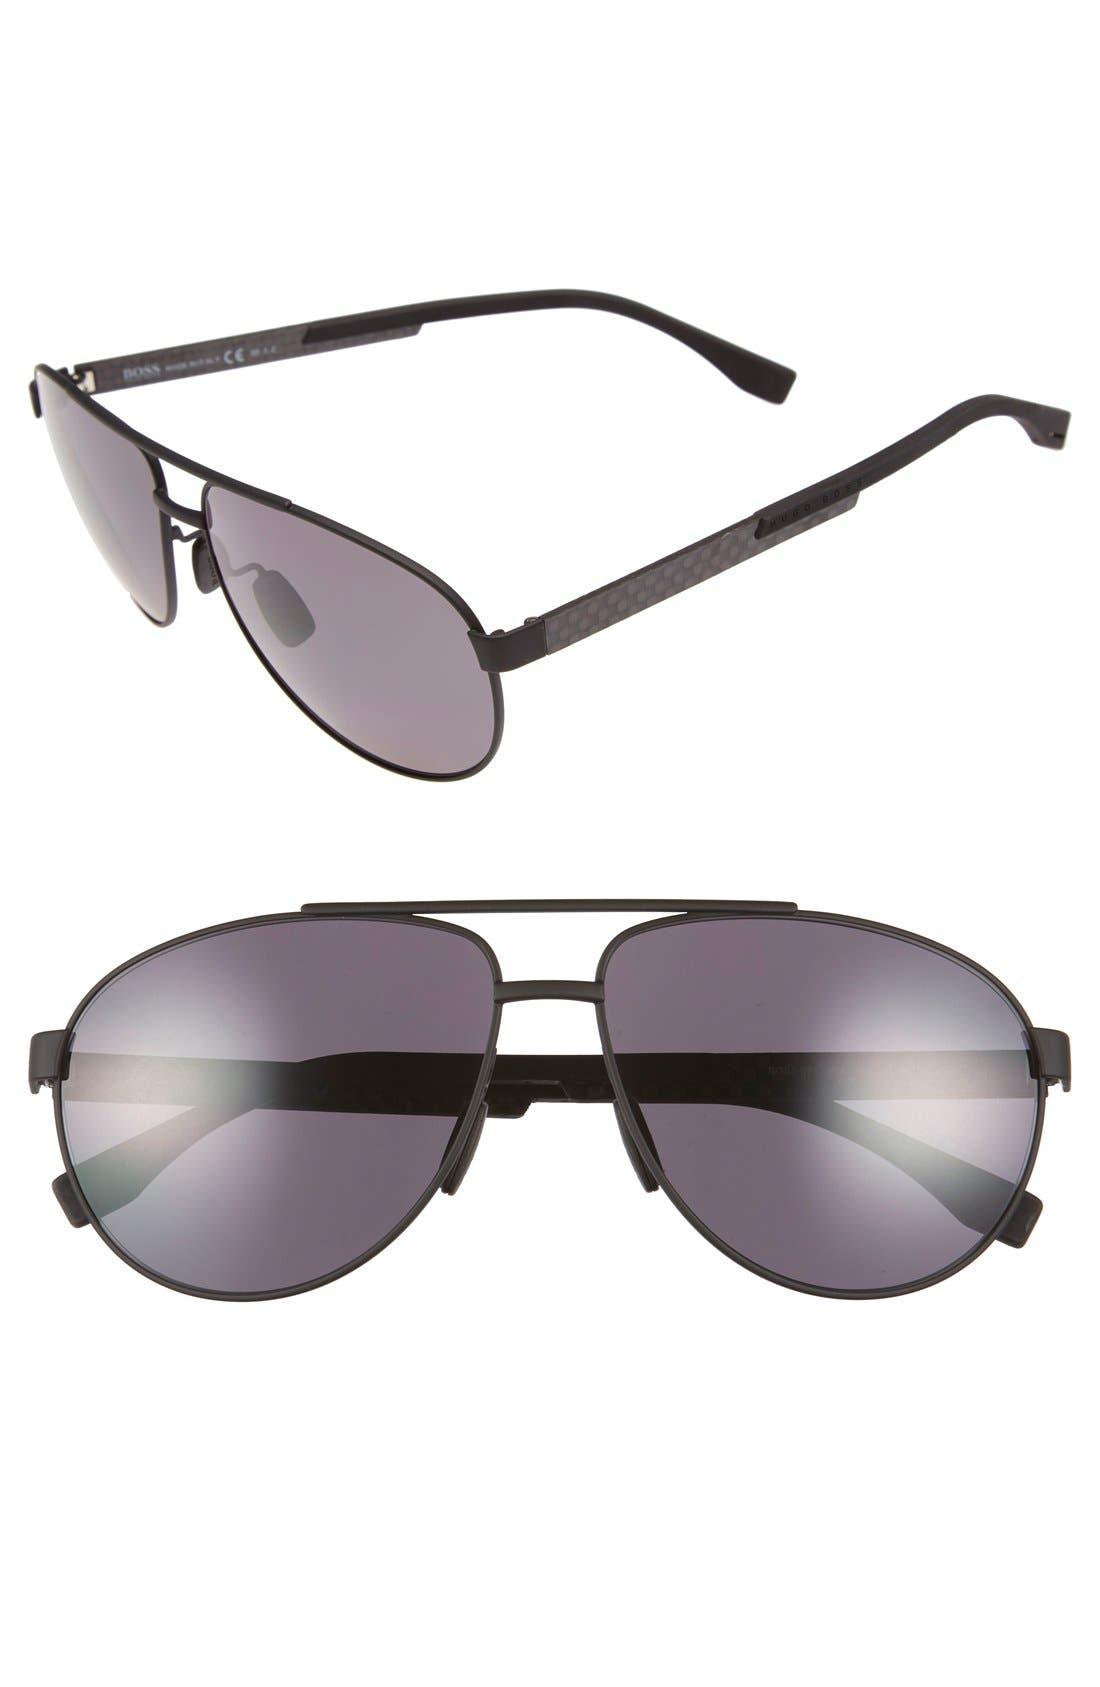 63mm Polarized Sunglasses,                         Main,                         color, Black Carbon/ Smoke Polarized